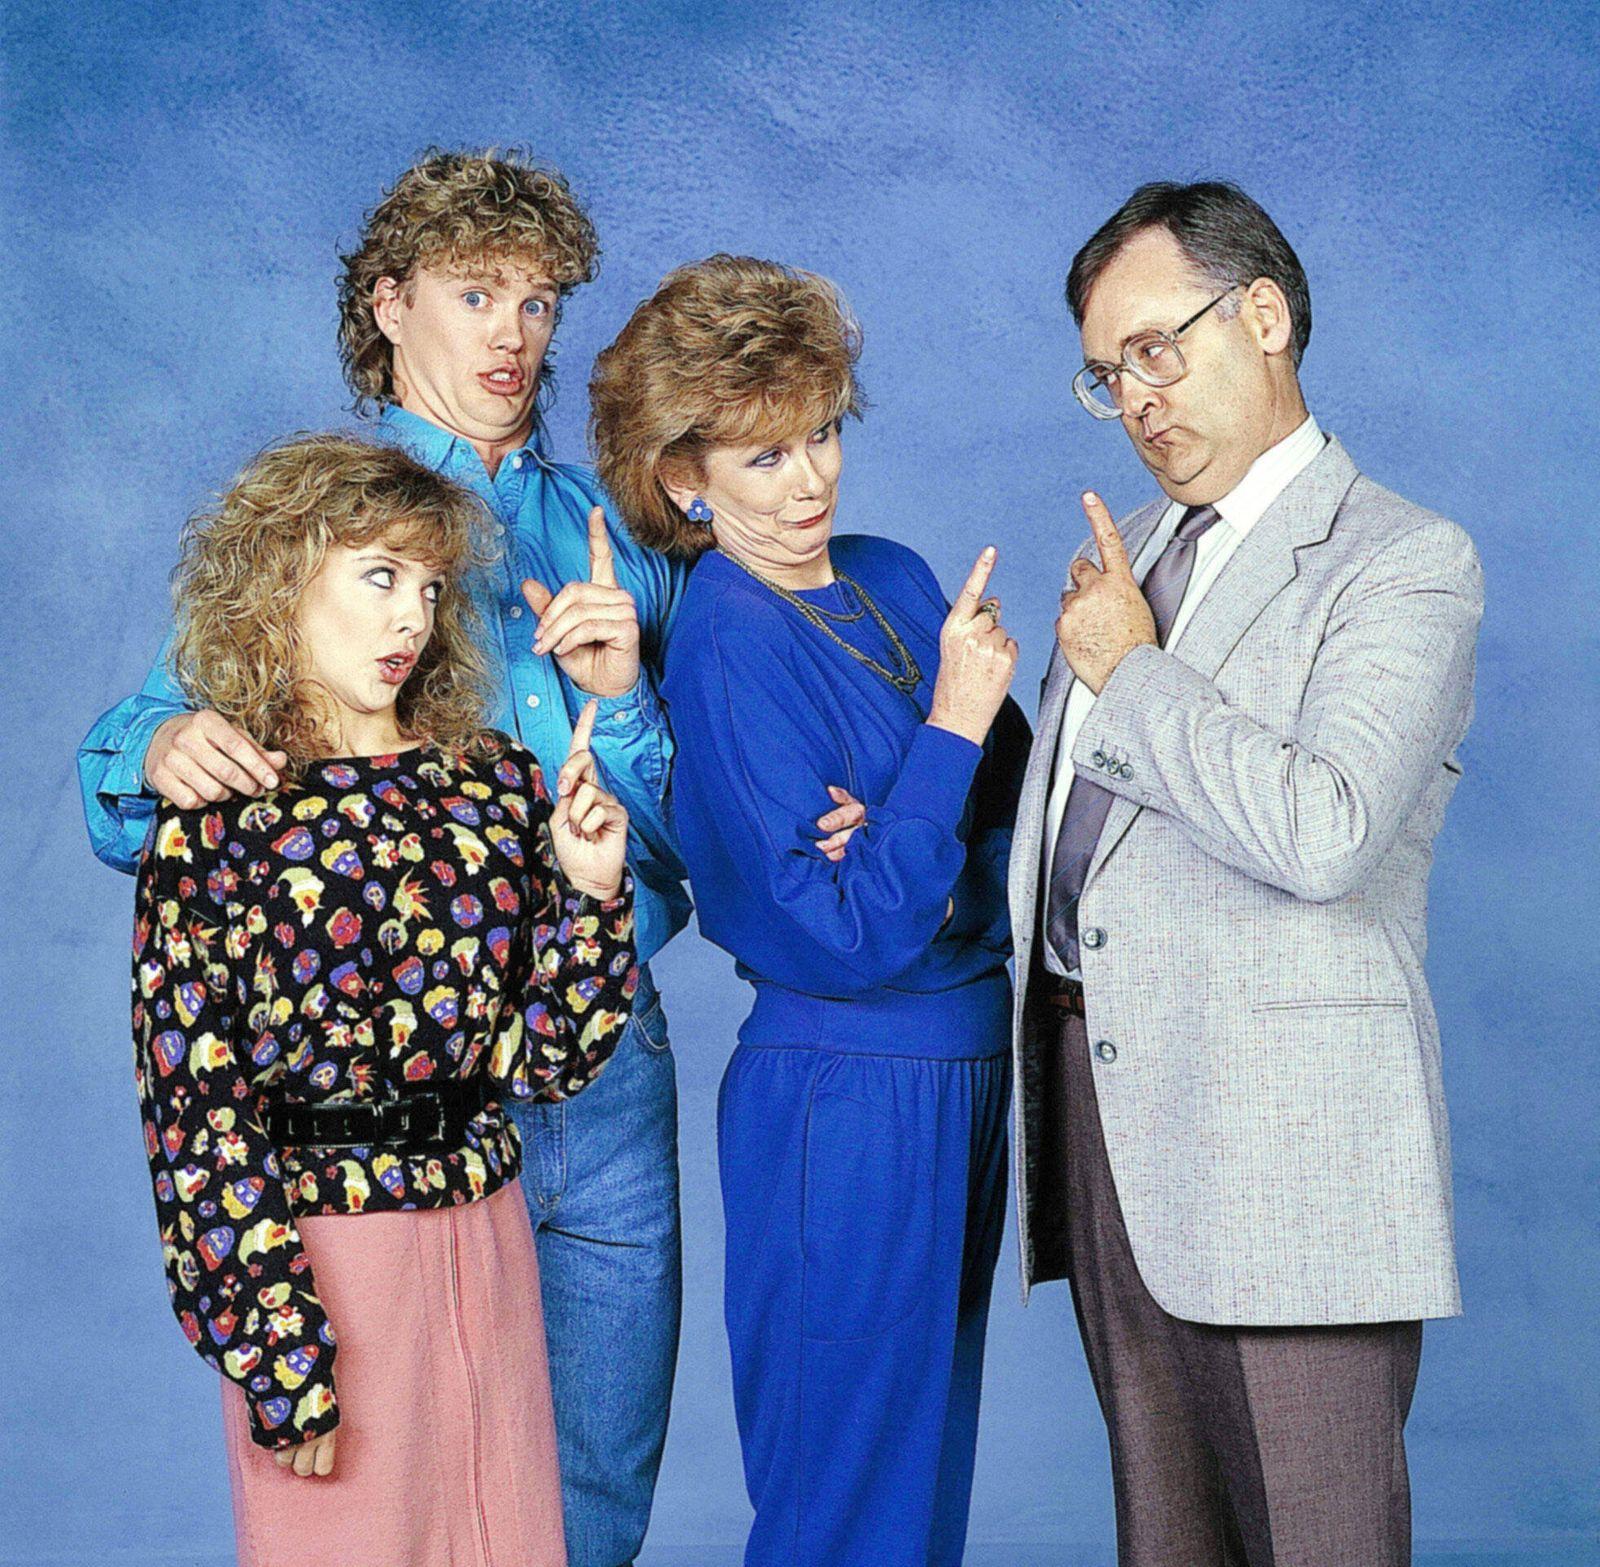 NEIGHBOURS, (from left): Kylie Minogue, Craig McLachlan, Anne Charleston, Ian Smith, (ca. 1980s), 1985-. Network Ten / C